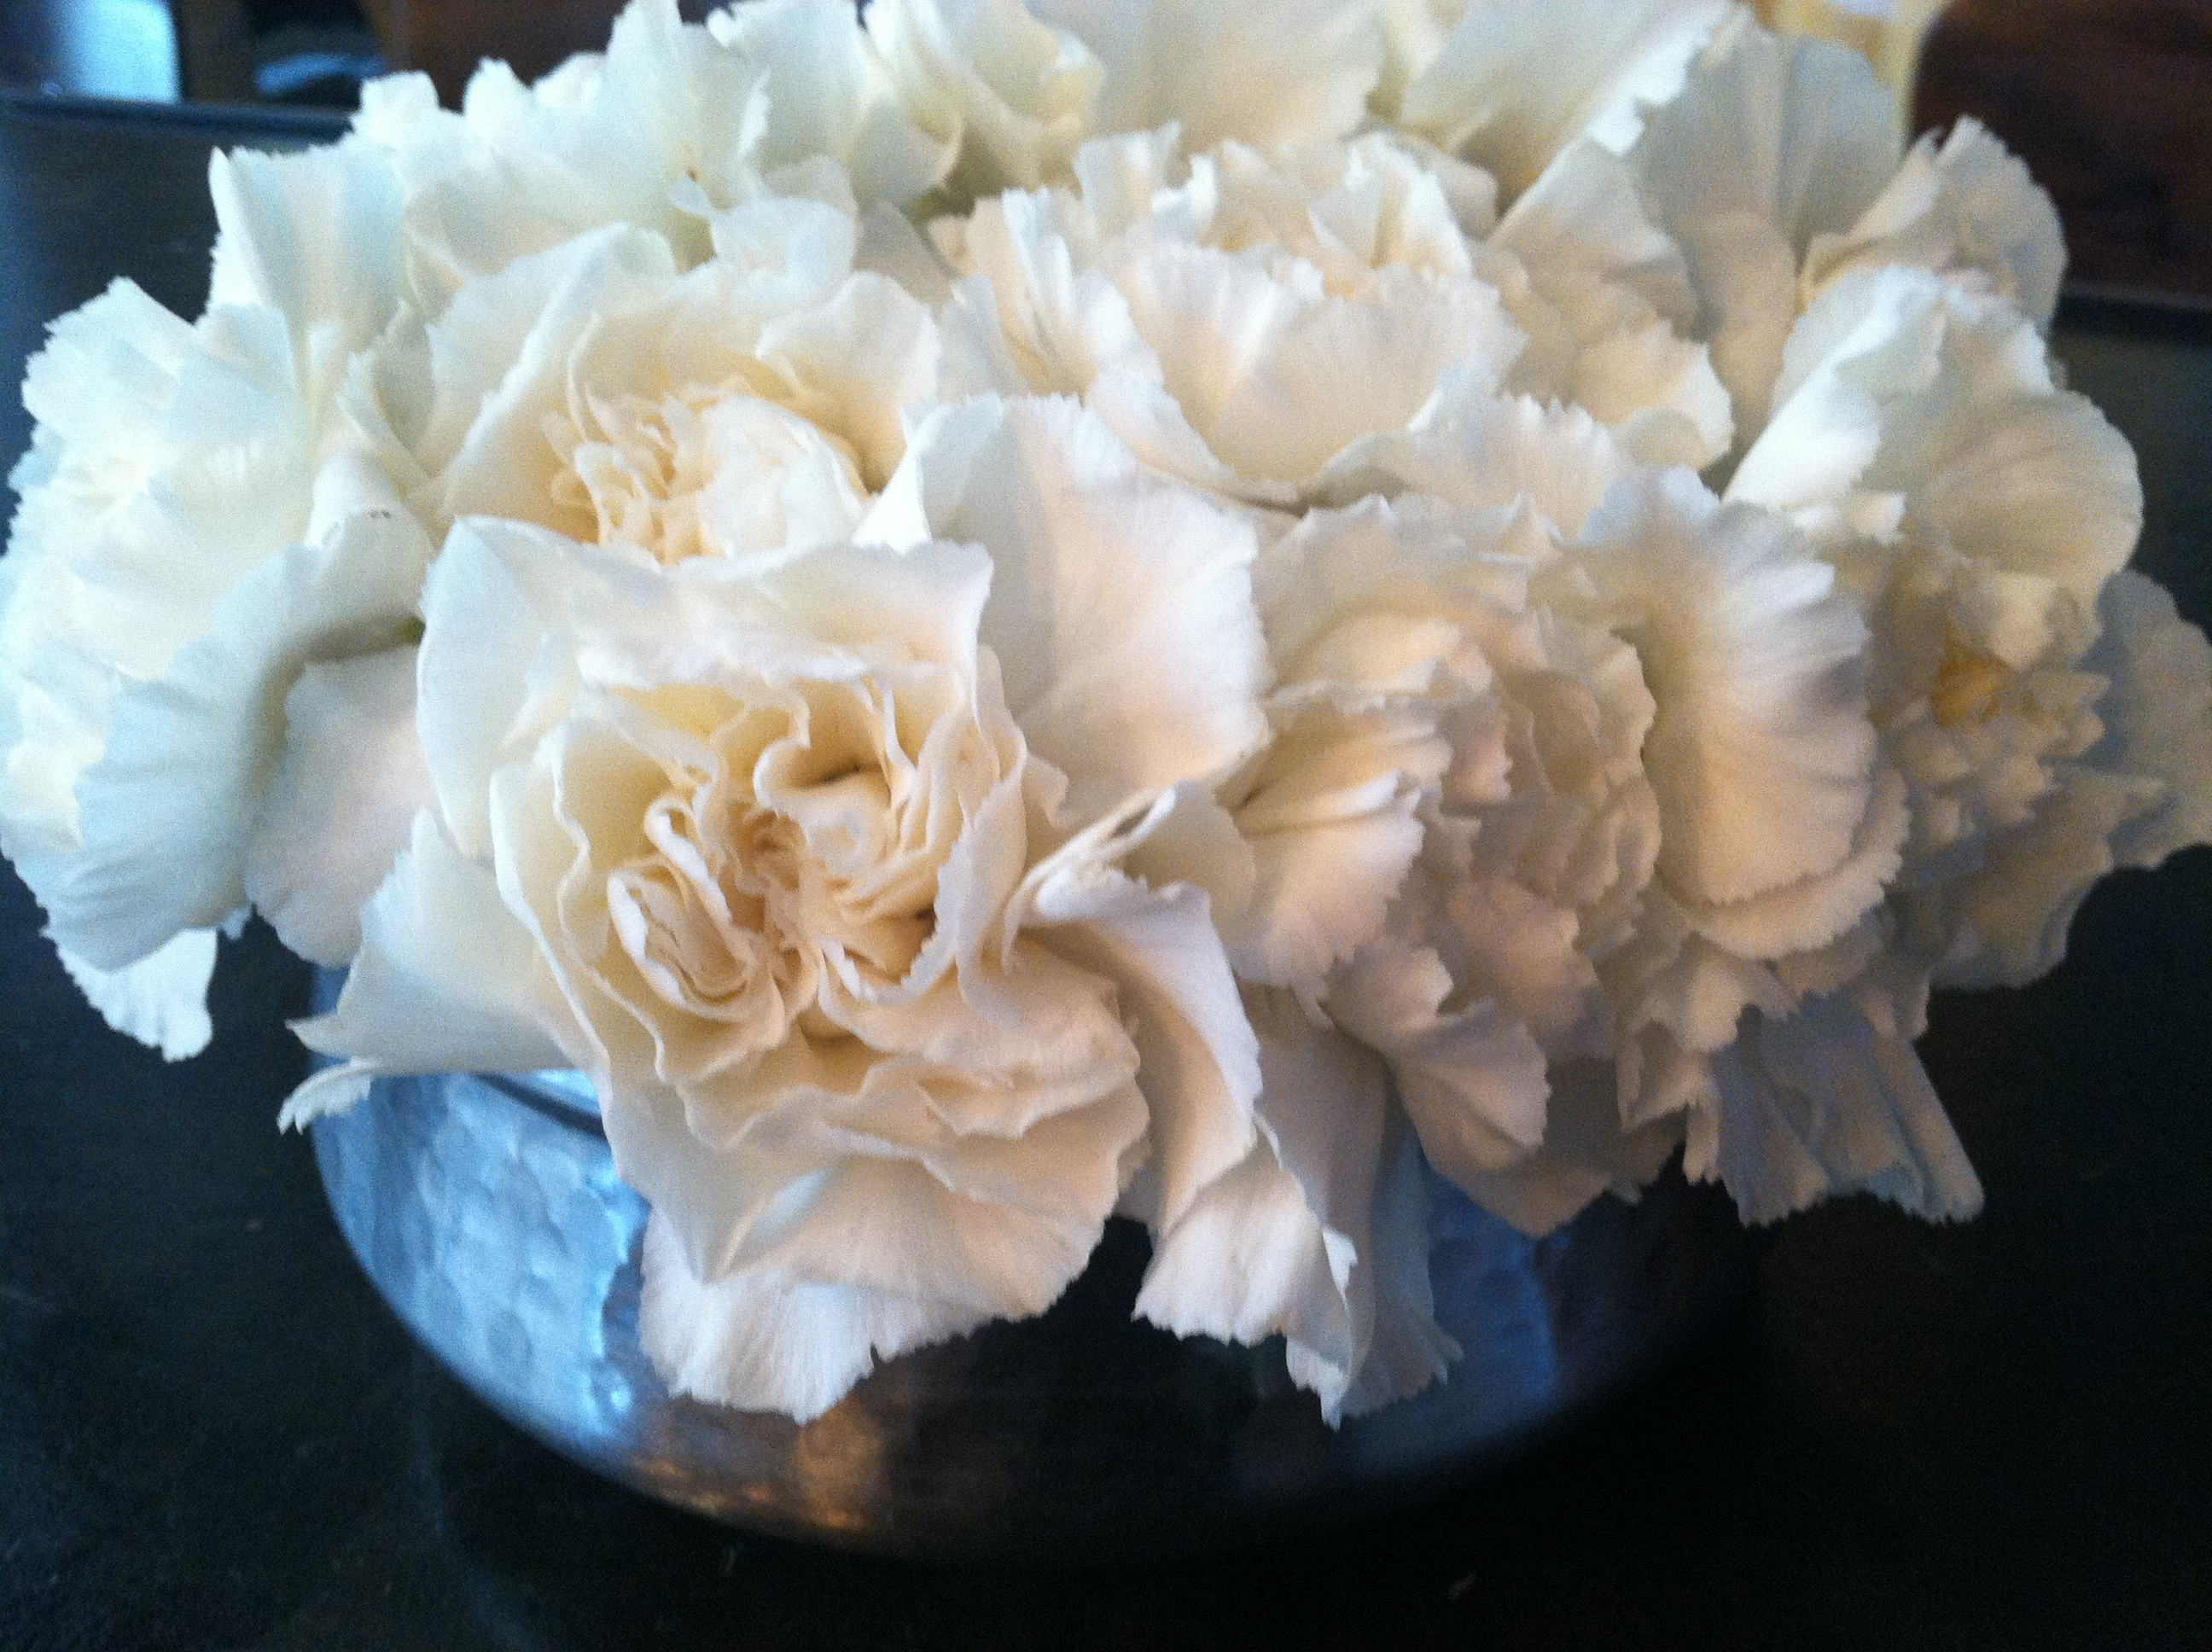 Flowerbaar  flowers style art inspiration